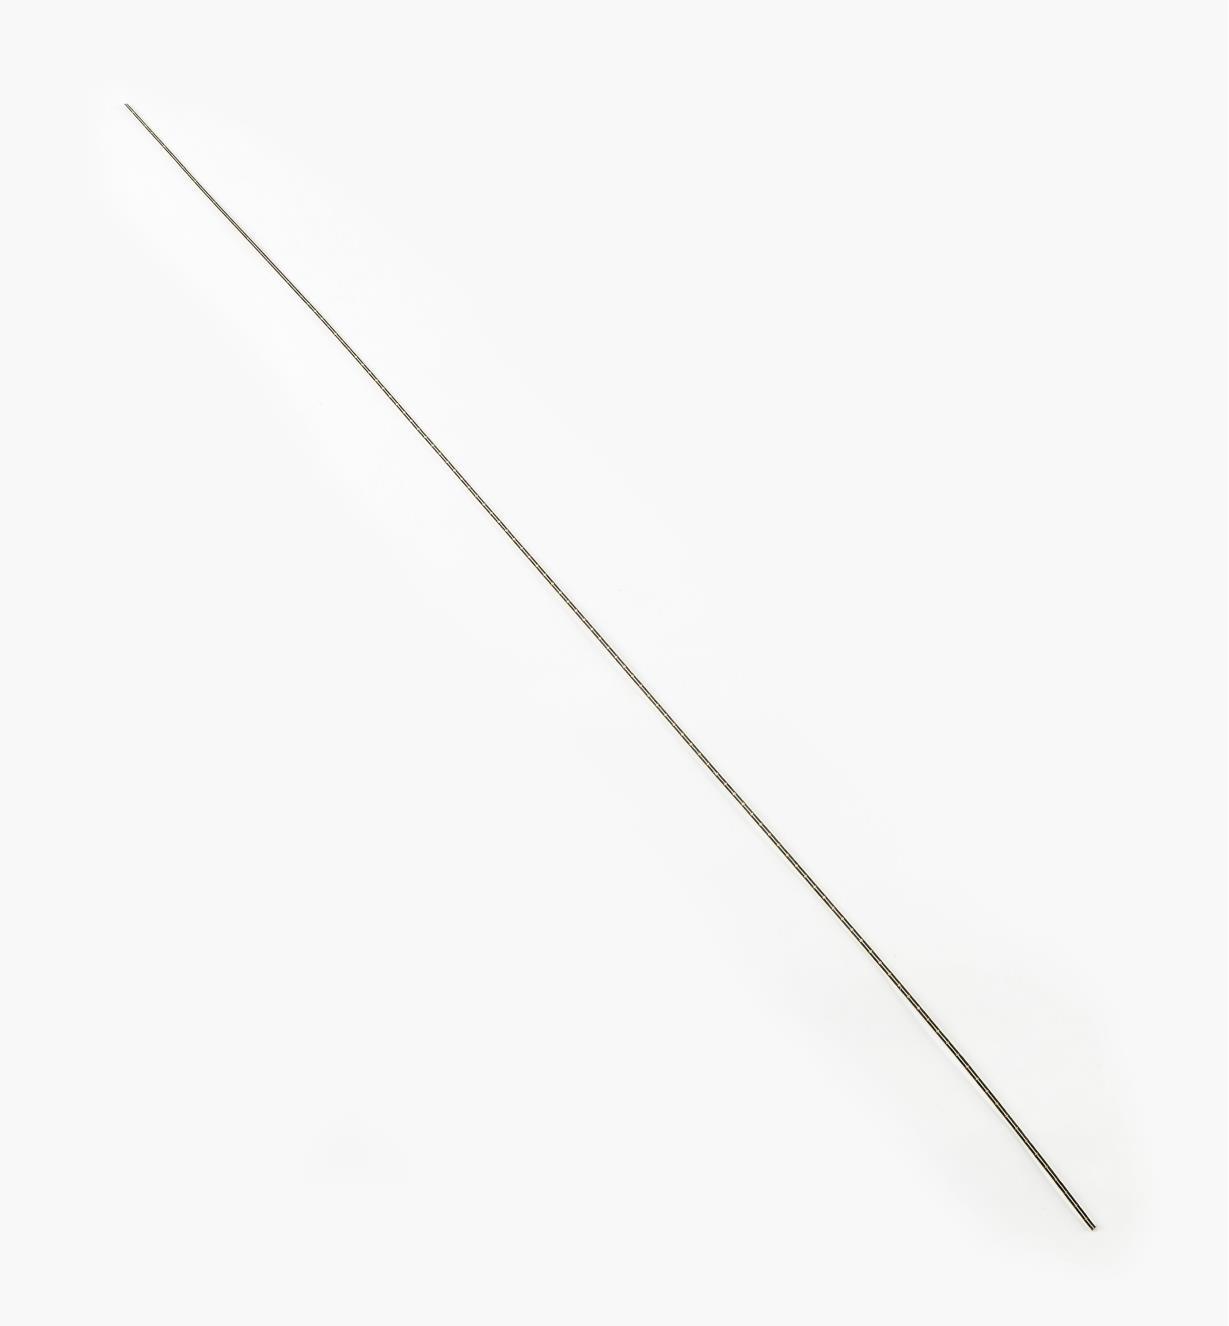 09A1033 - Bande mosaïque à incruster – 4mm, Code morse, par mètre